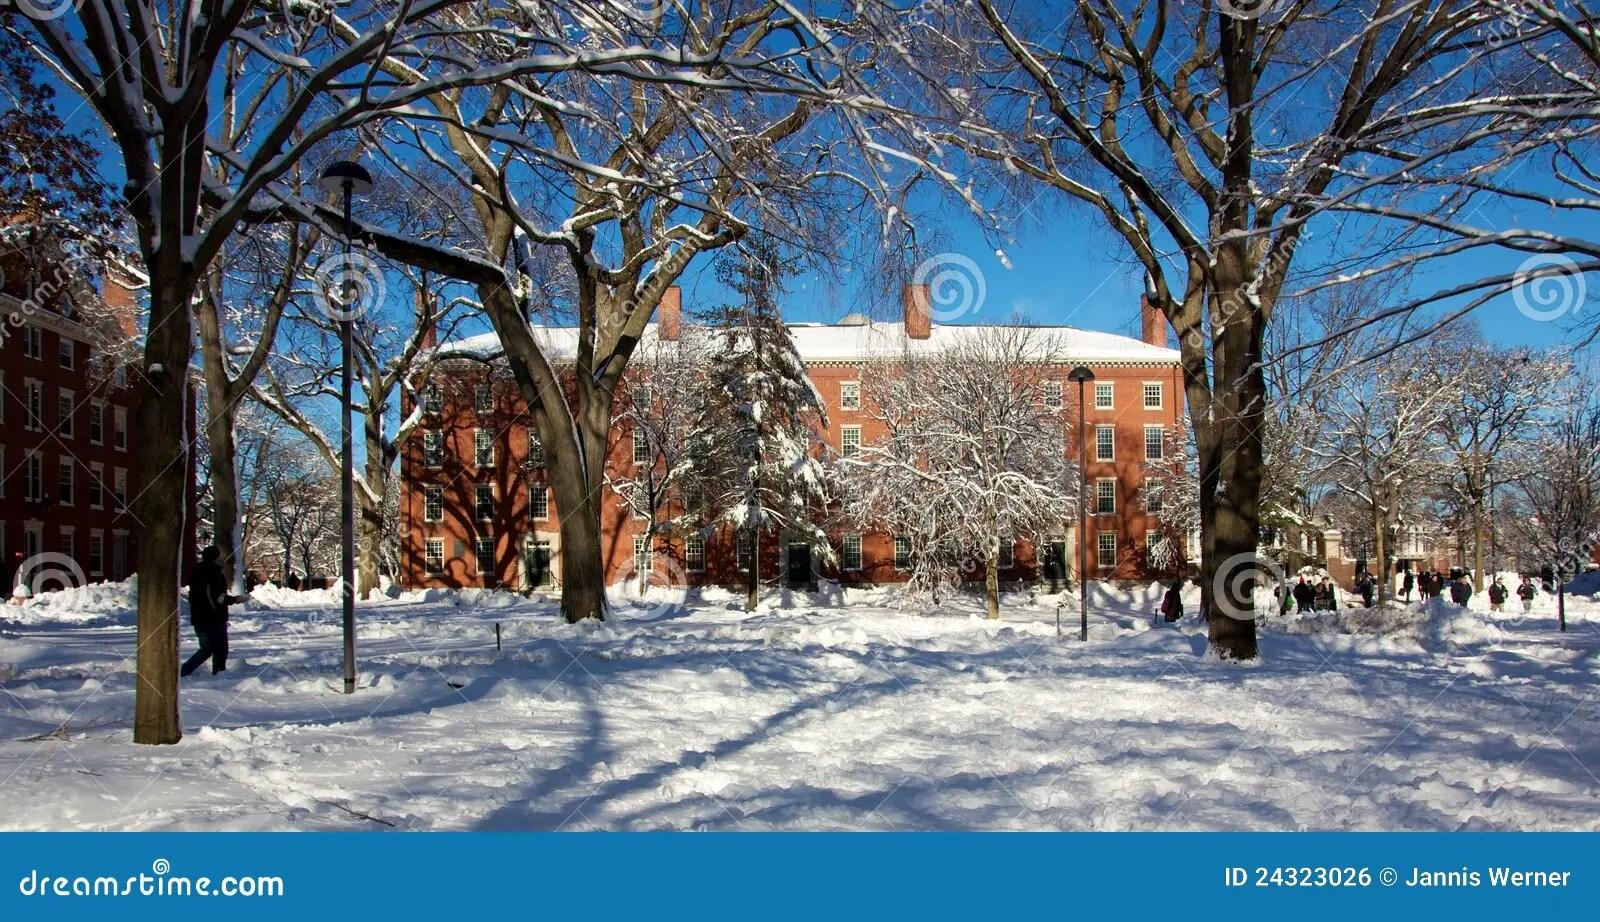 Wallpaper Desktop 3d Animation Harvard University Campus Dorm After A Snow Storm